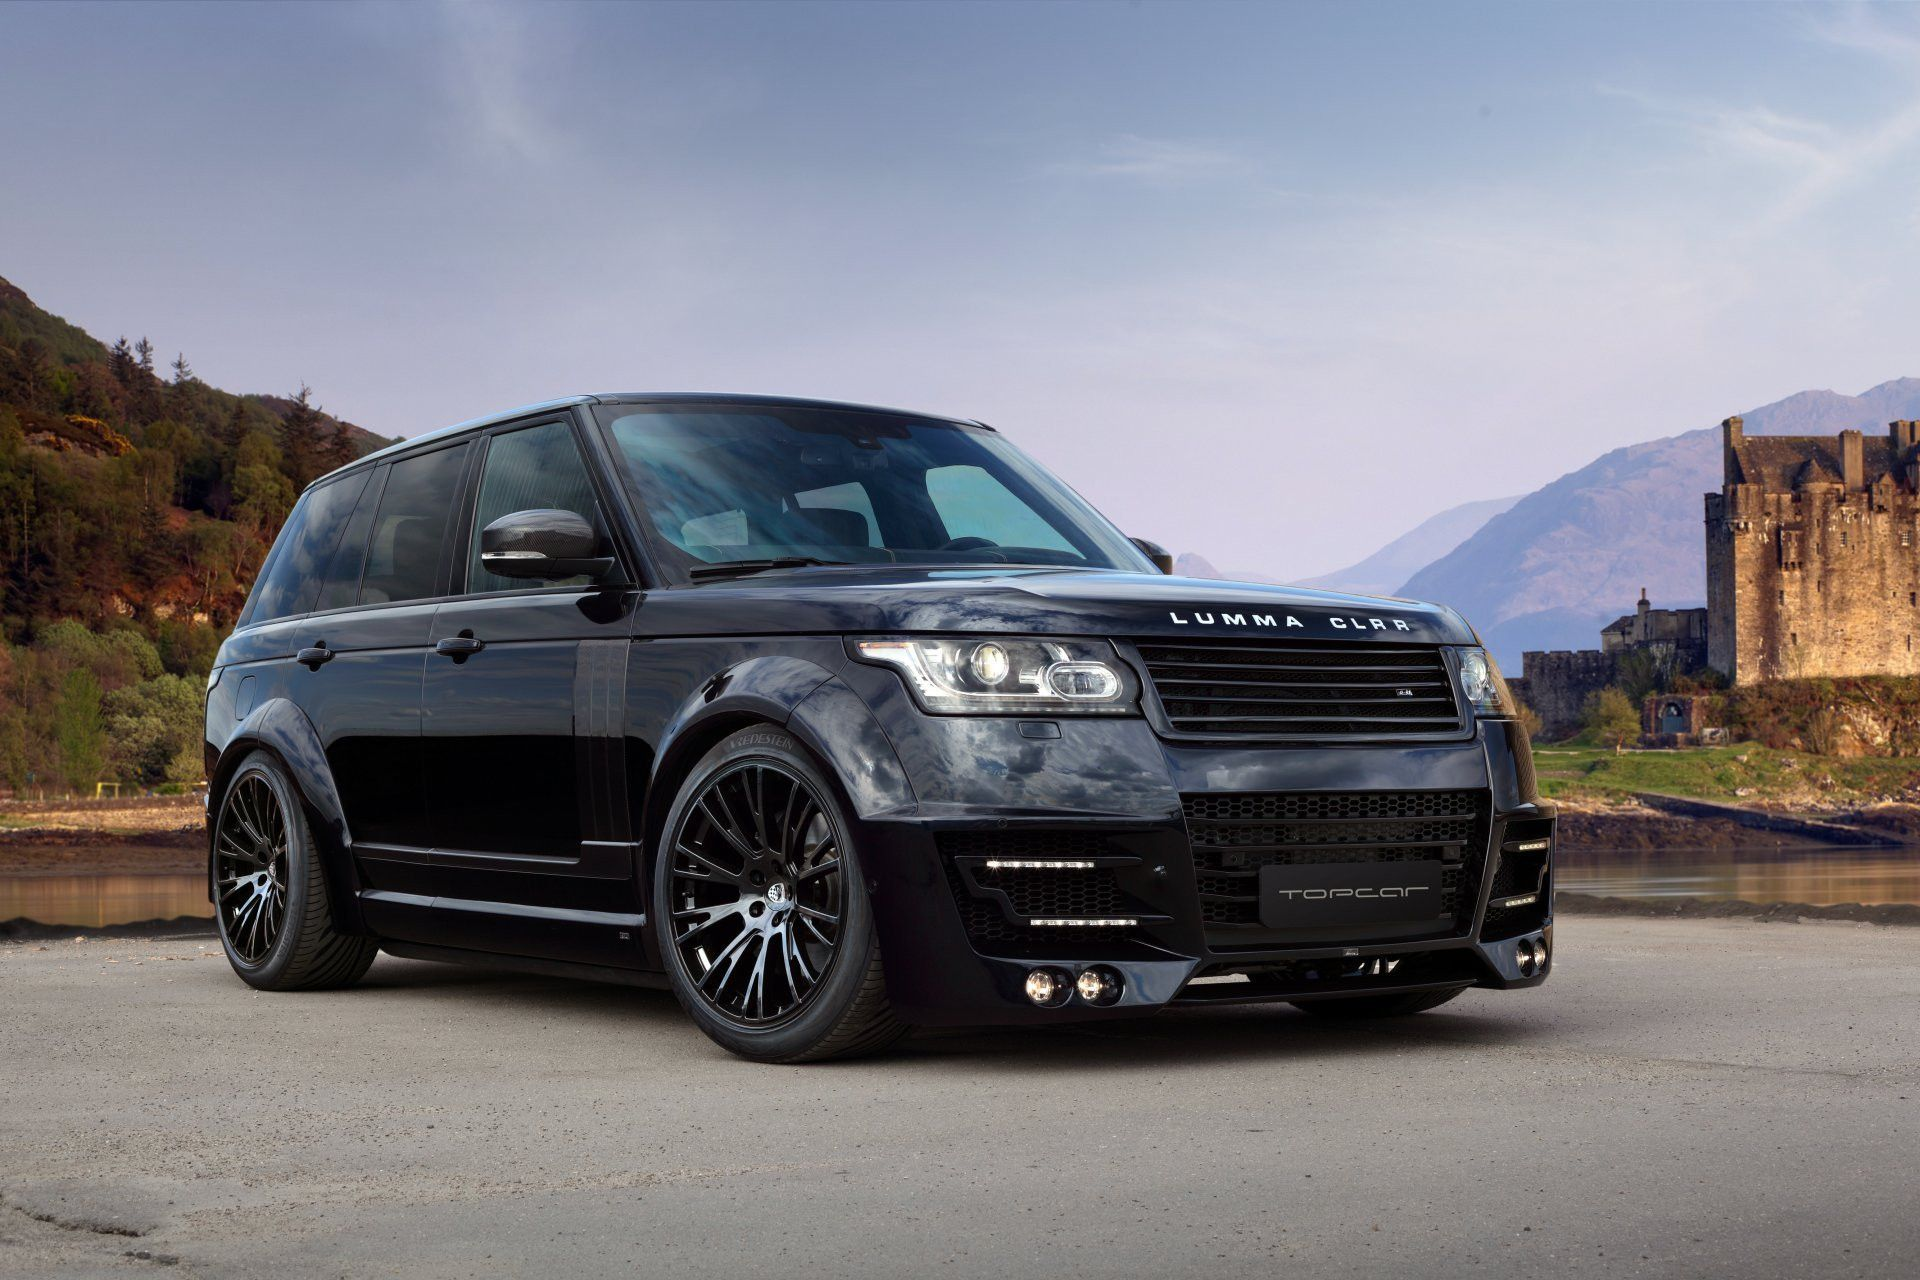 Range Rover Sport Tunning HP Elegant Cars HP